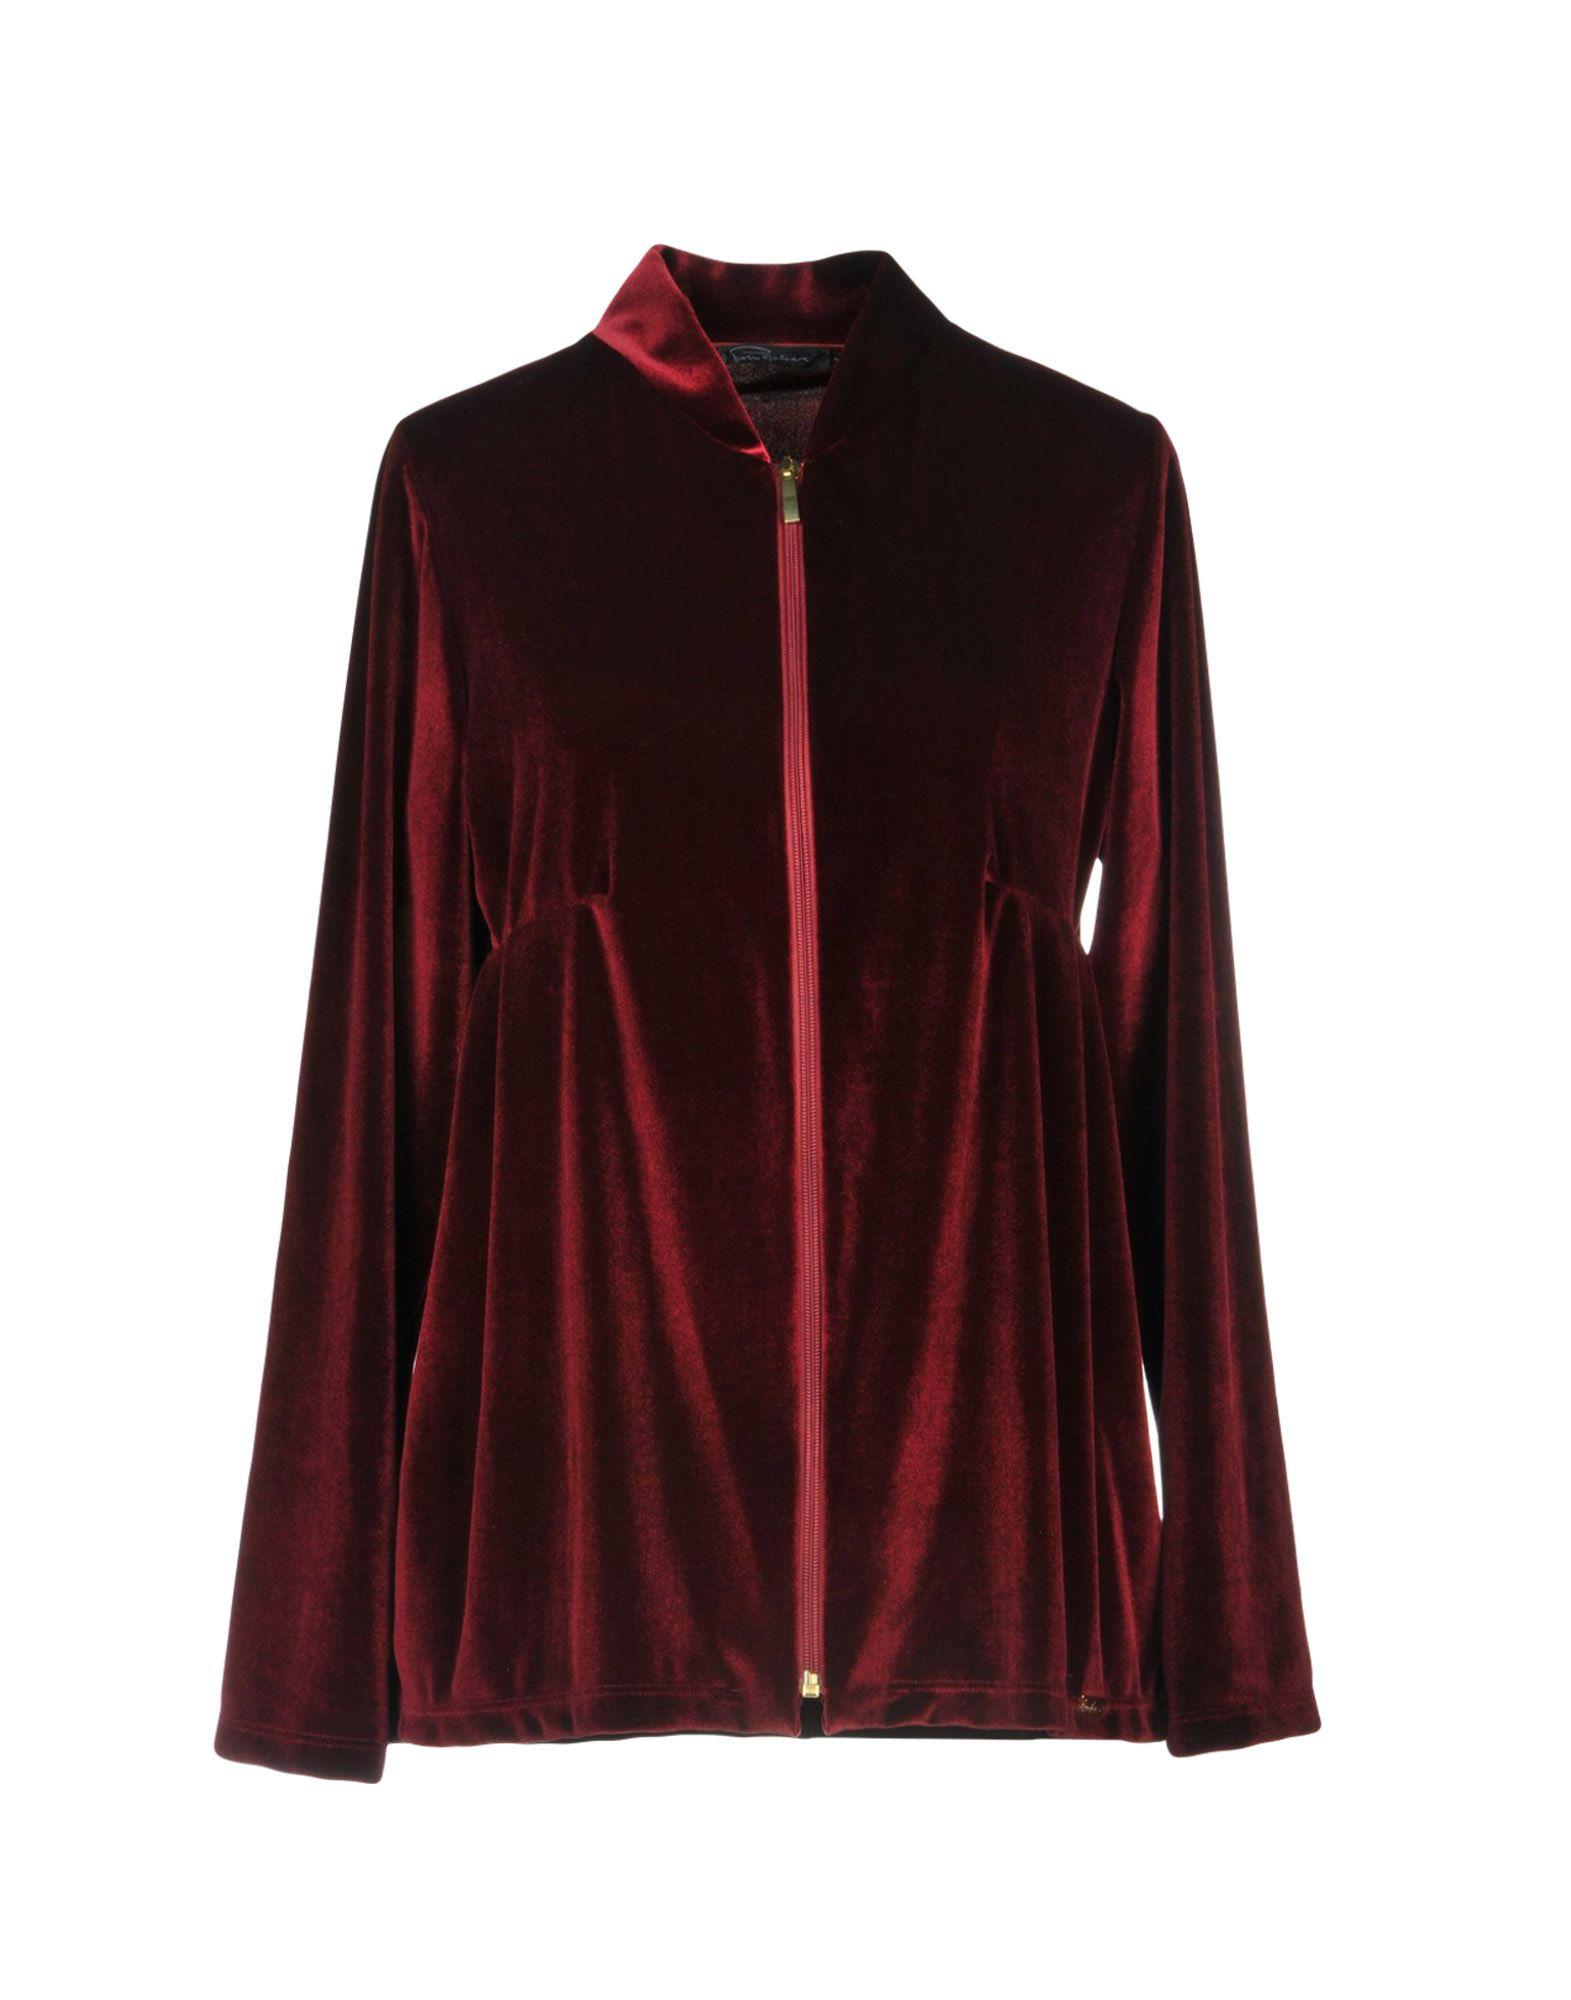 PIERRE MANTOUX Sweatshirt in Maroon